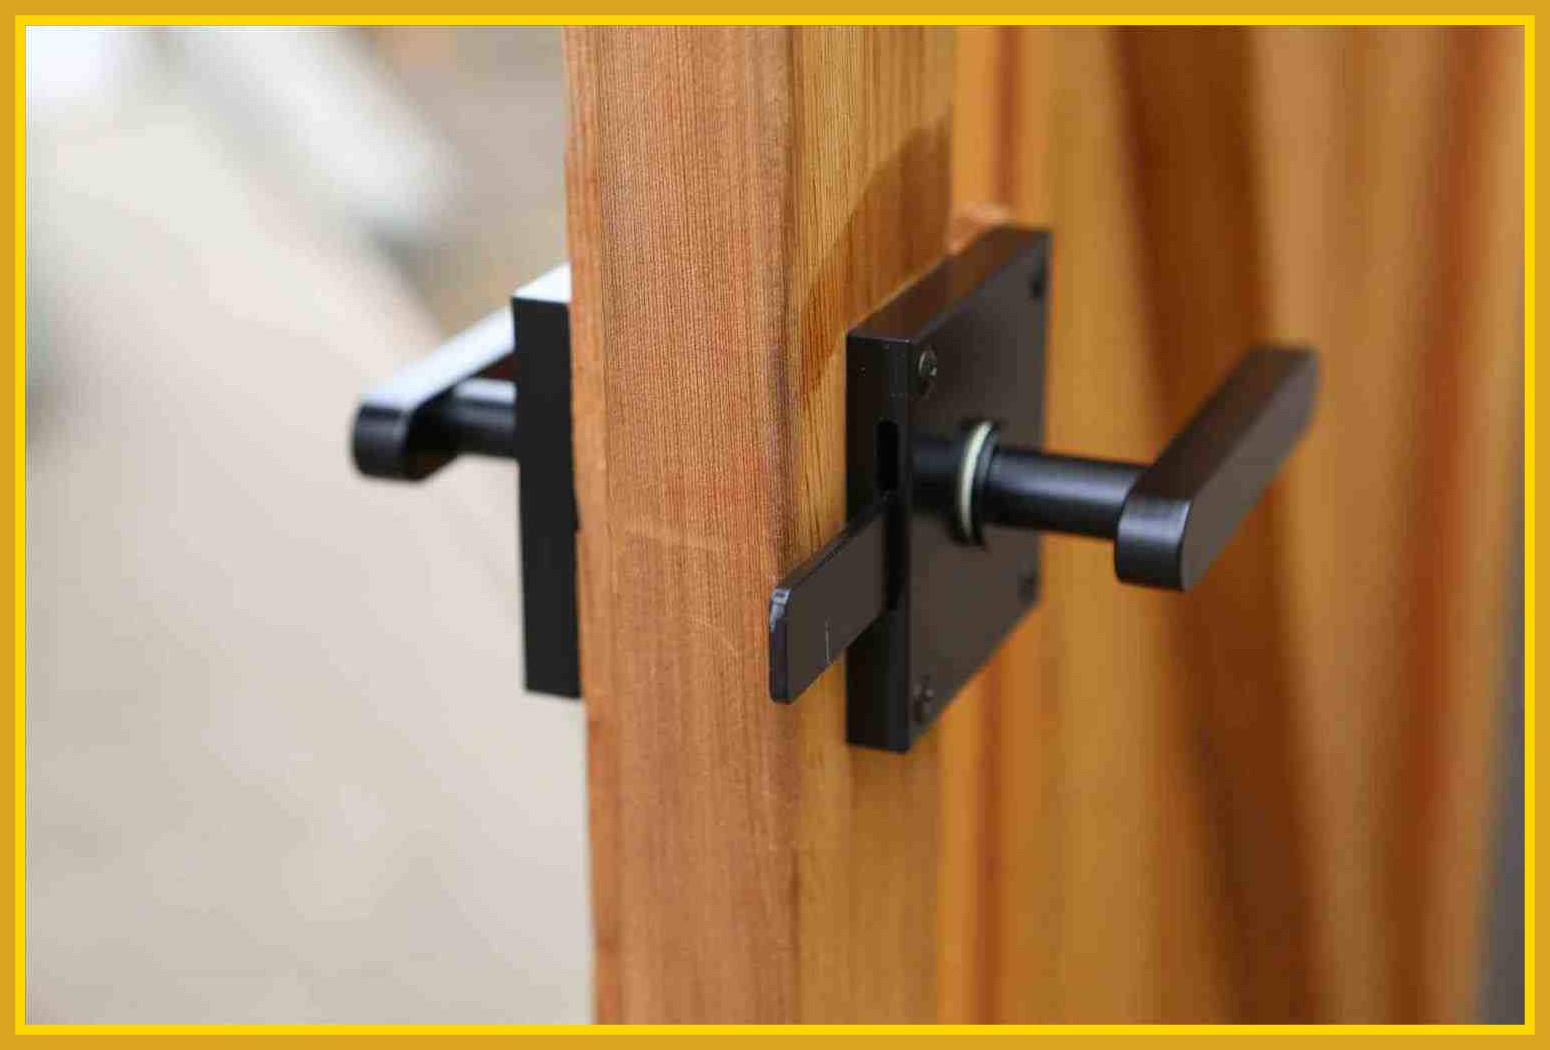 Astonishing Fence Gate Latch Ideas Publizzity Image Of Lock Keypad in proportions 1550 X 1050